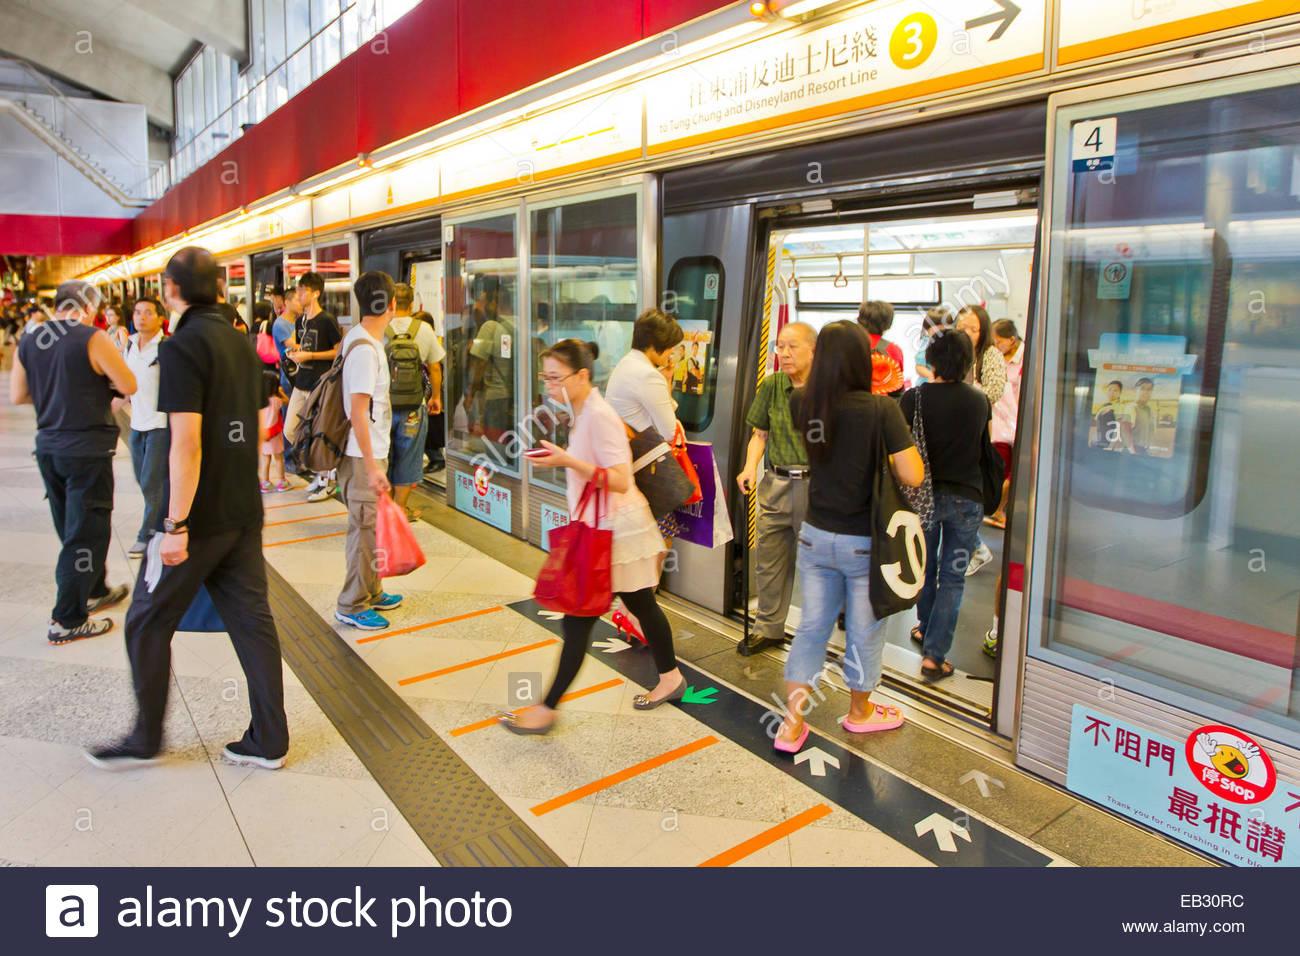 Travelers getting off at a subway station in Hong Kong. - Stock Image